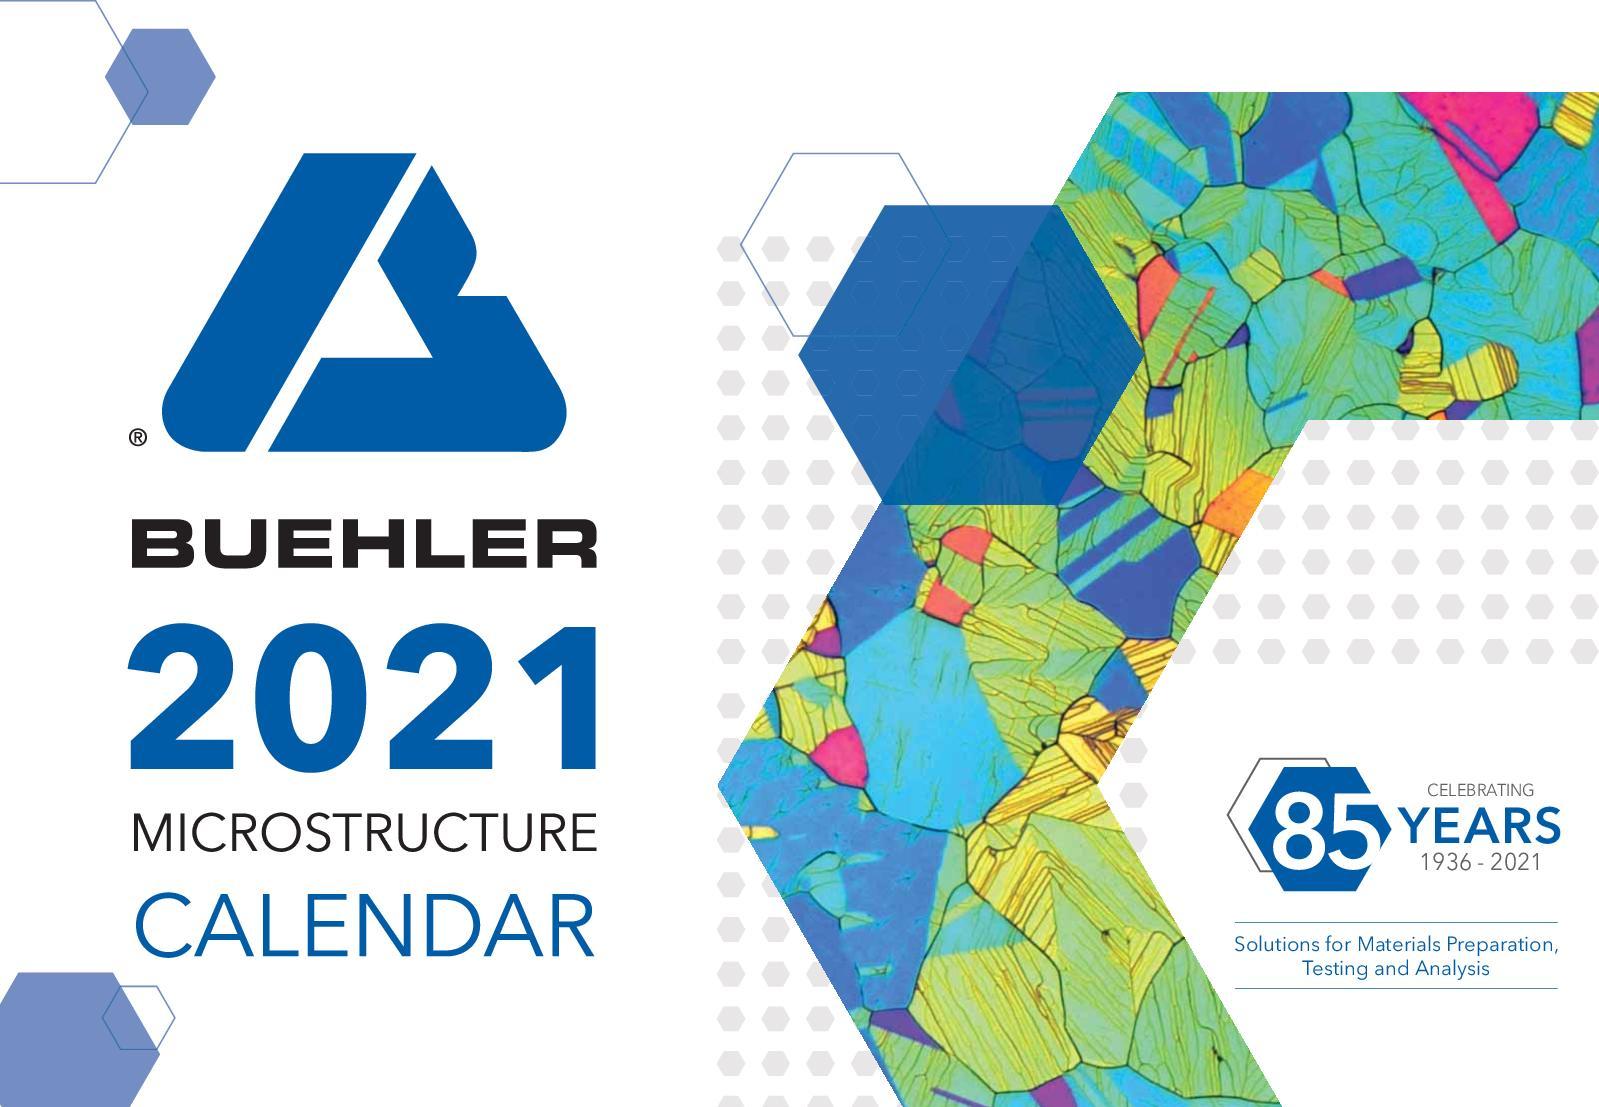 Binghamton University Spring 2022 Calendar.Calameo 2021 Buehler Microstructure Calendar